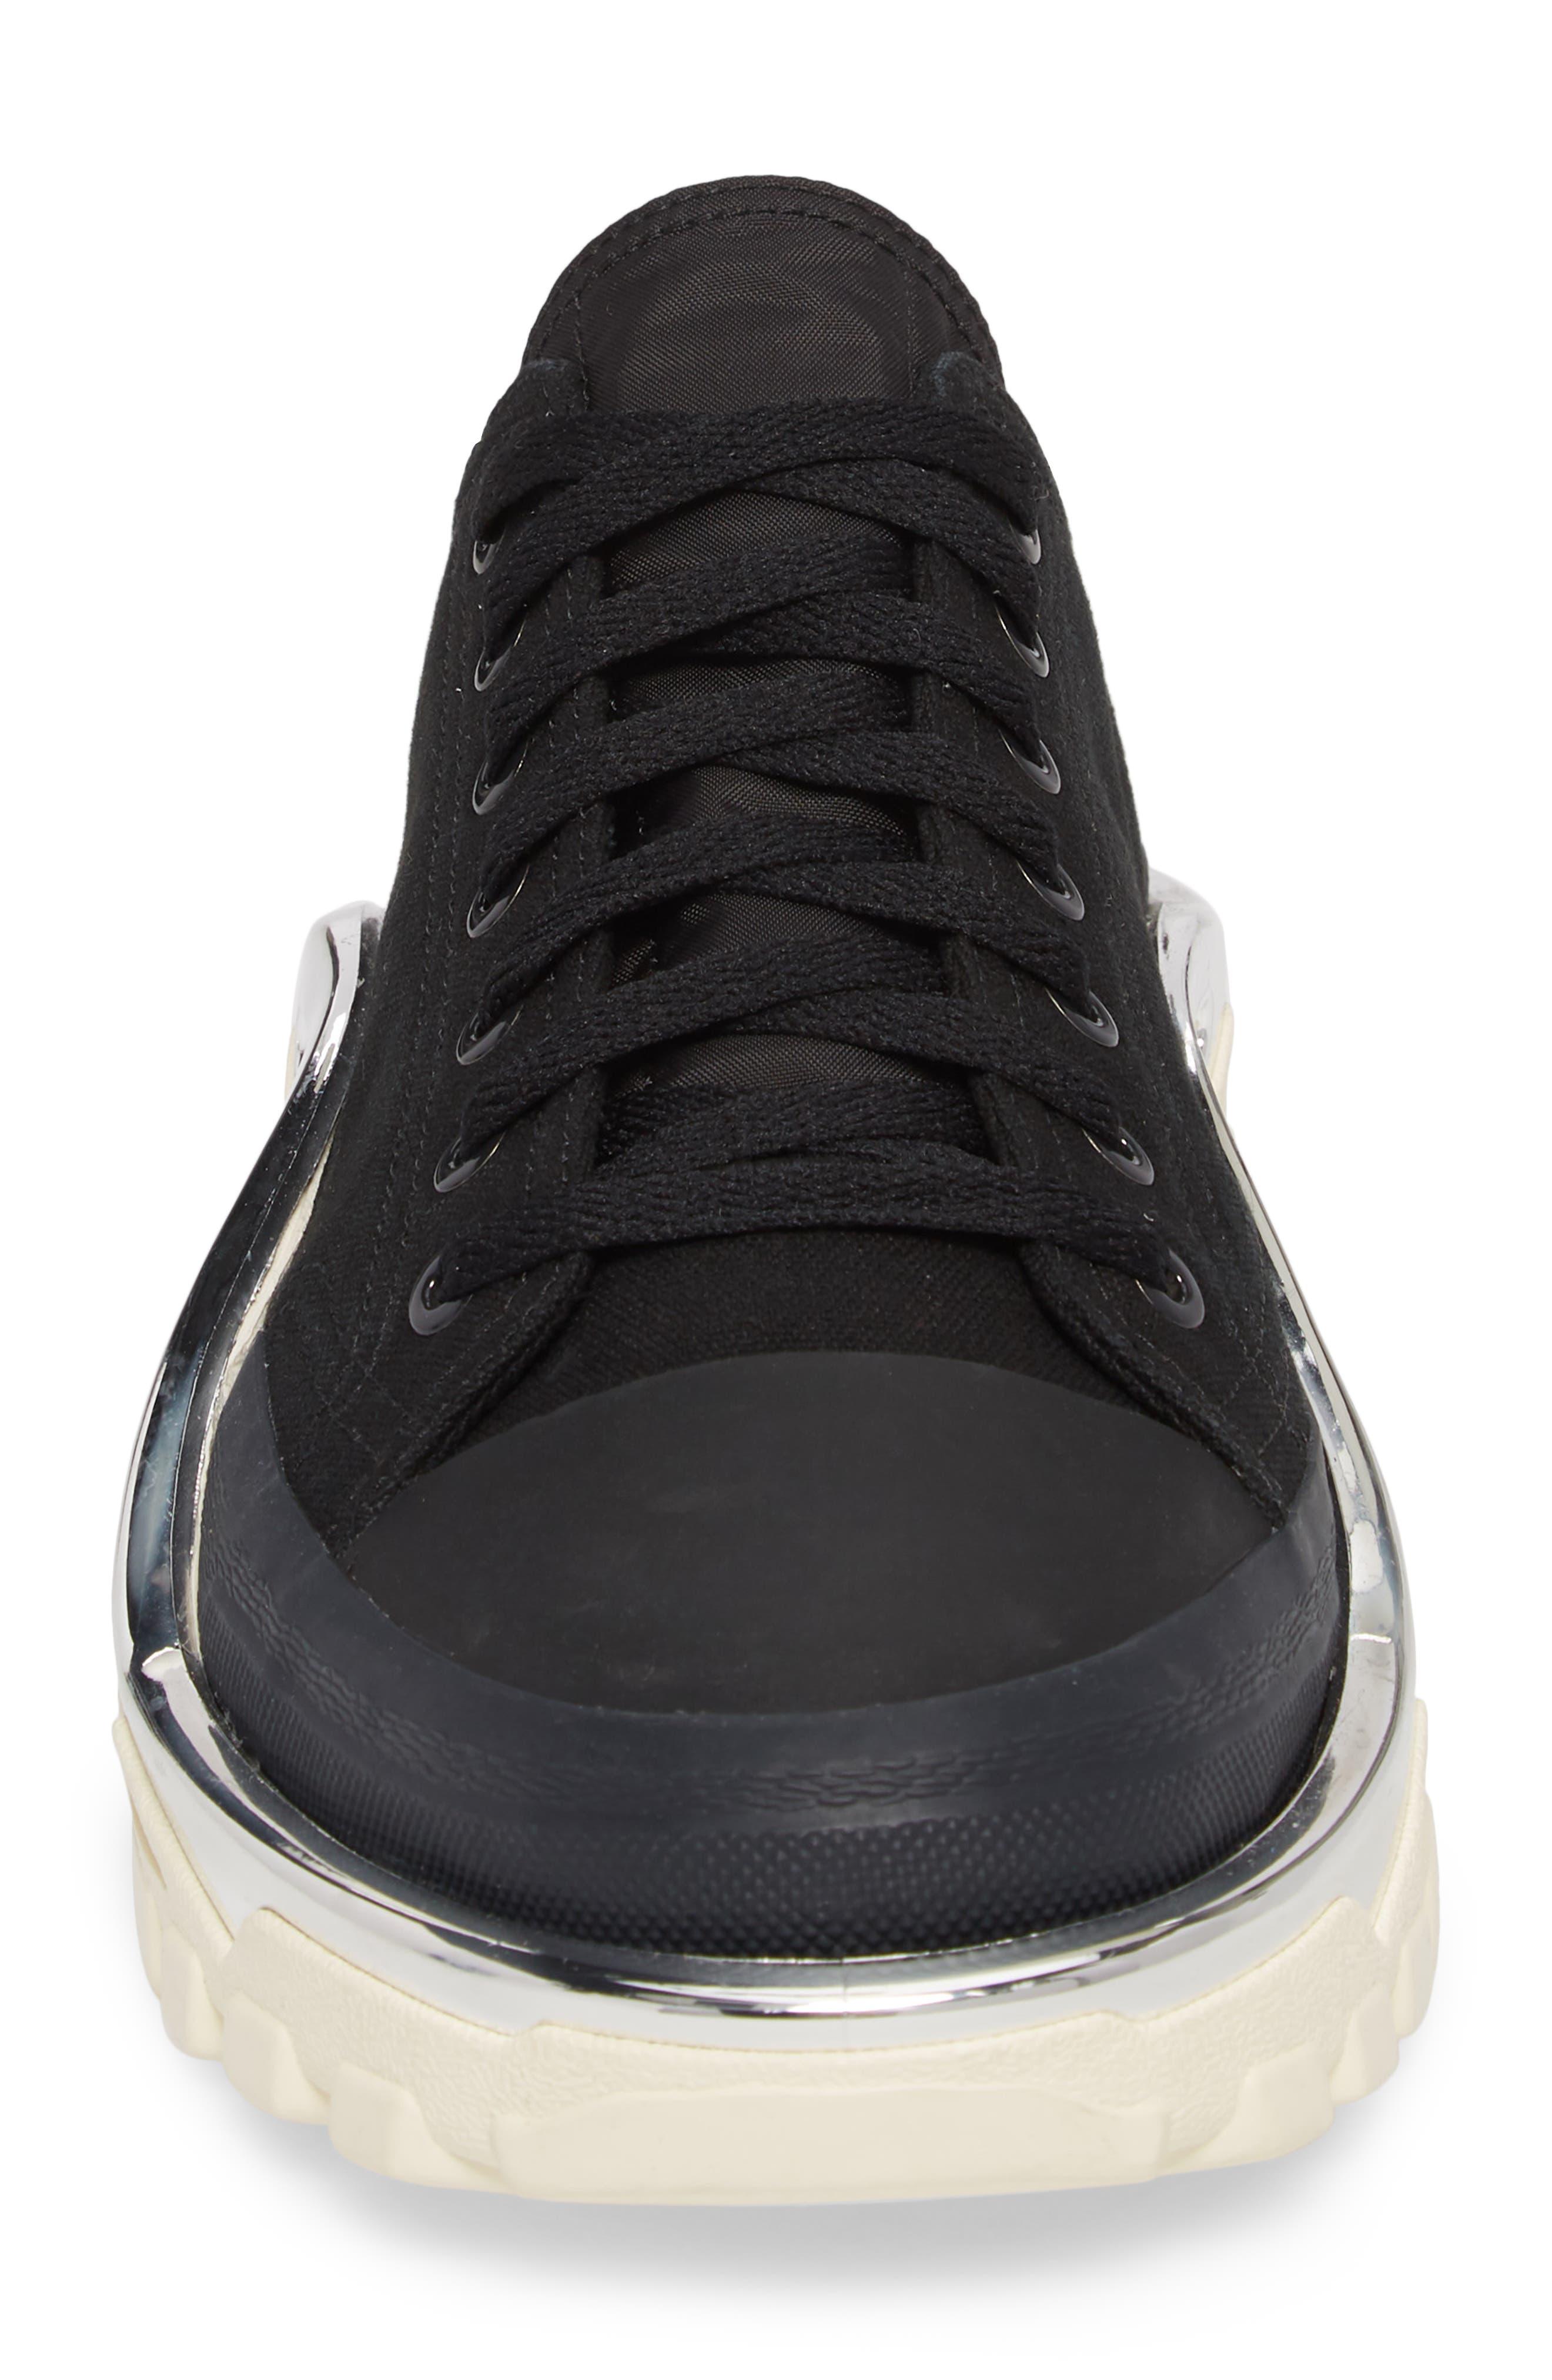 adidas by Raf Simons Detroit Low Top Sneaker,                             Alternate thumbnail 4, color,                             CORE BLACK/ CREAM WHITE